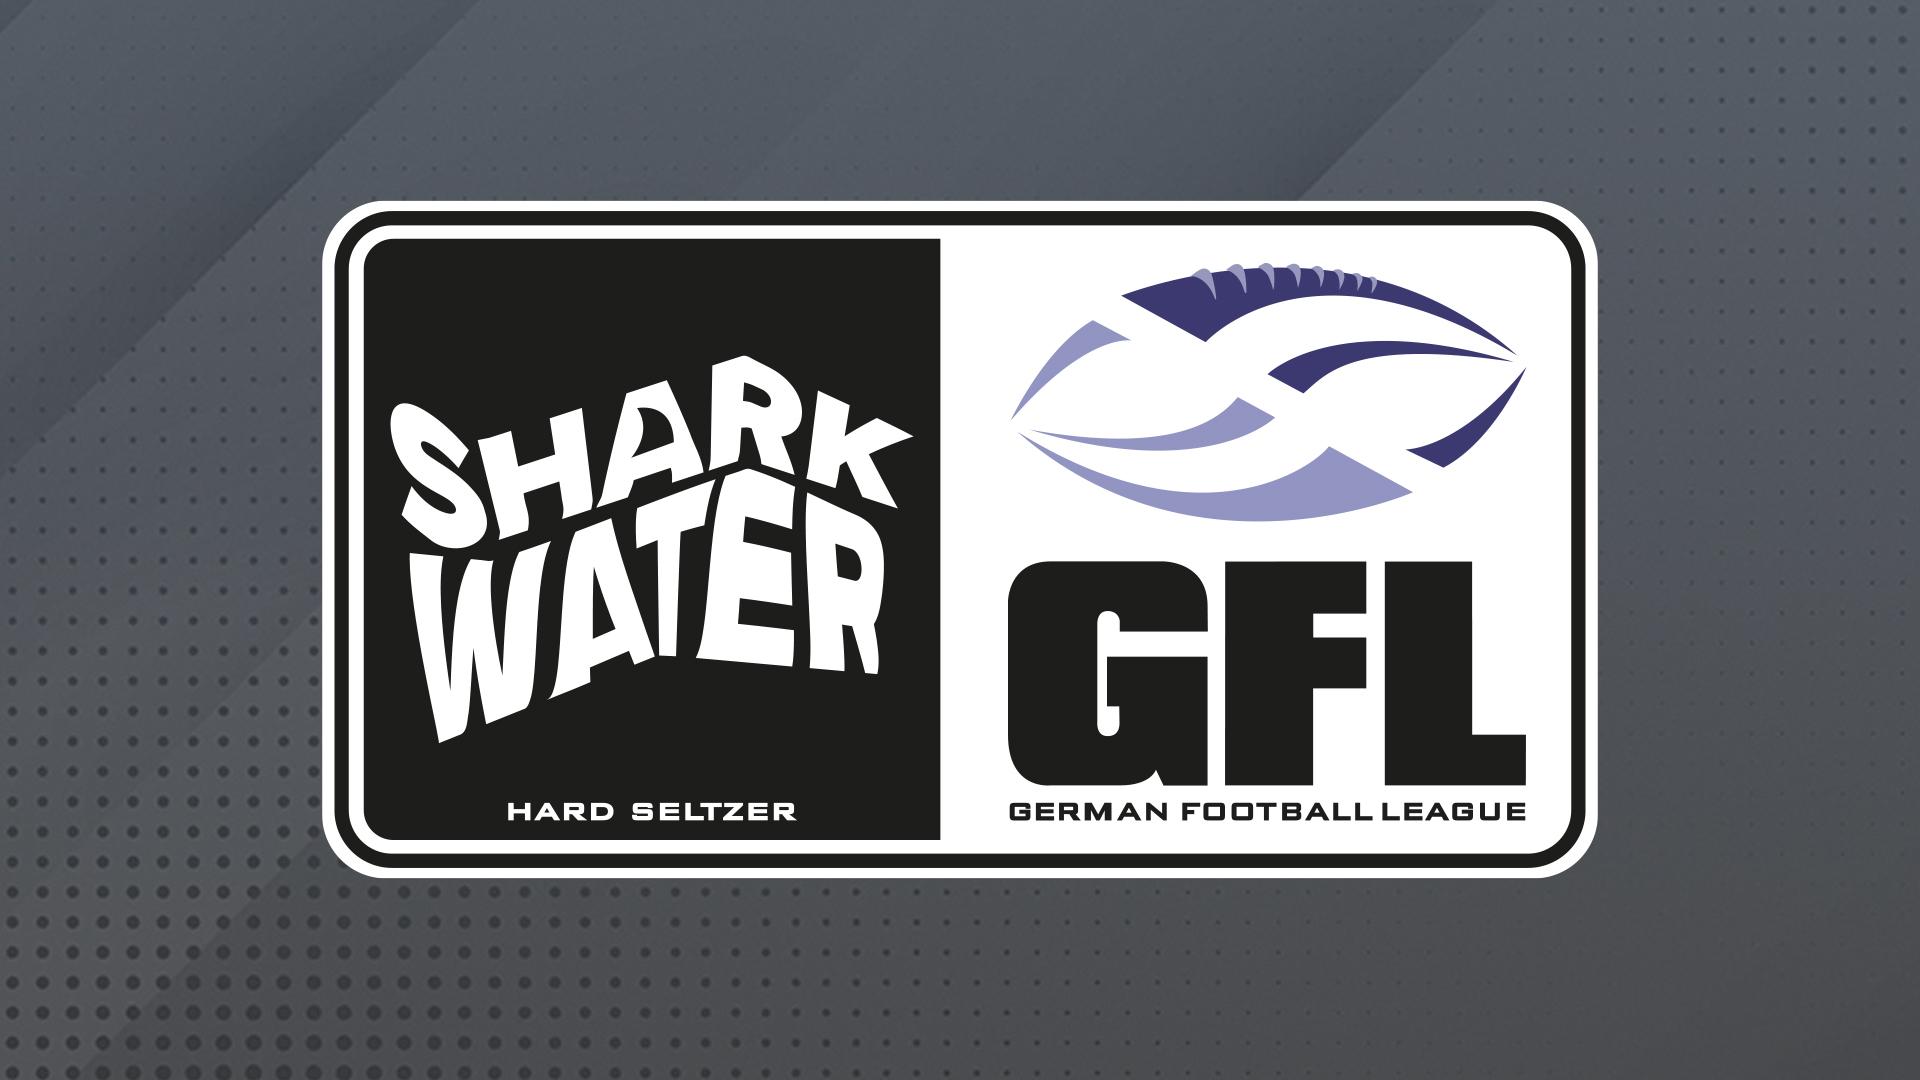 20210610_News_SharkWater_GFL